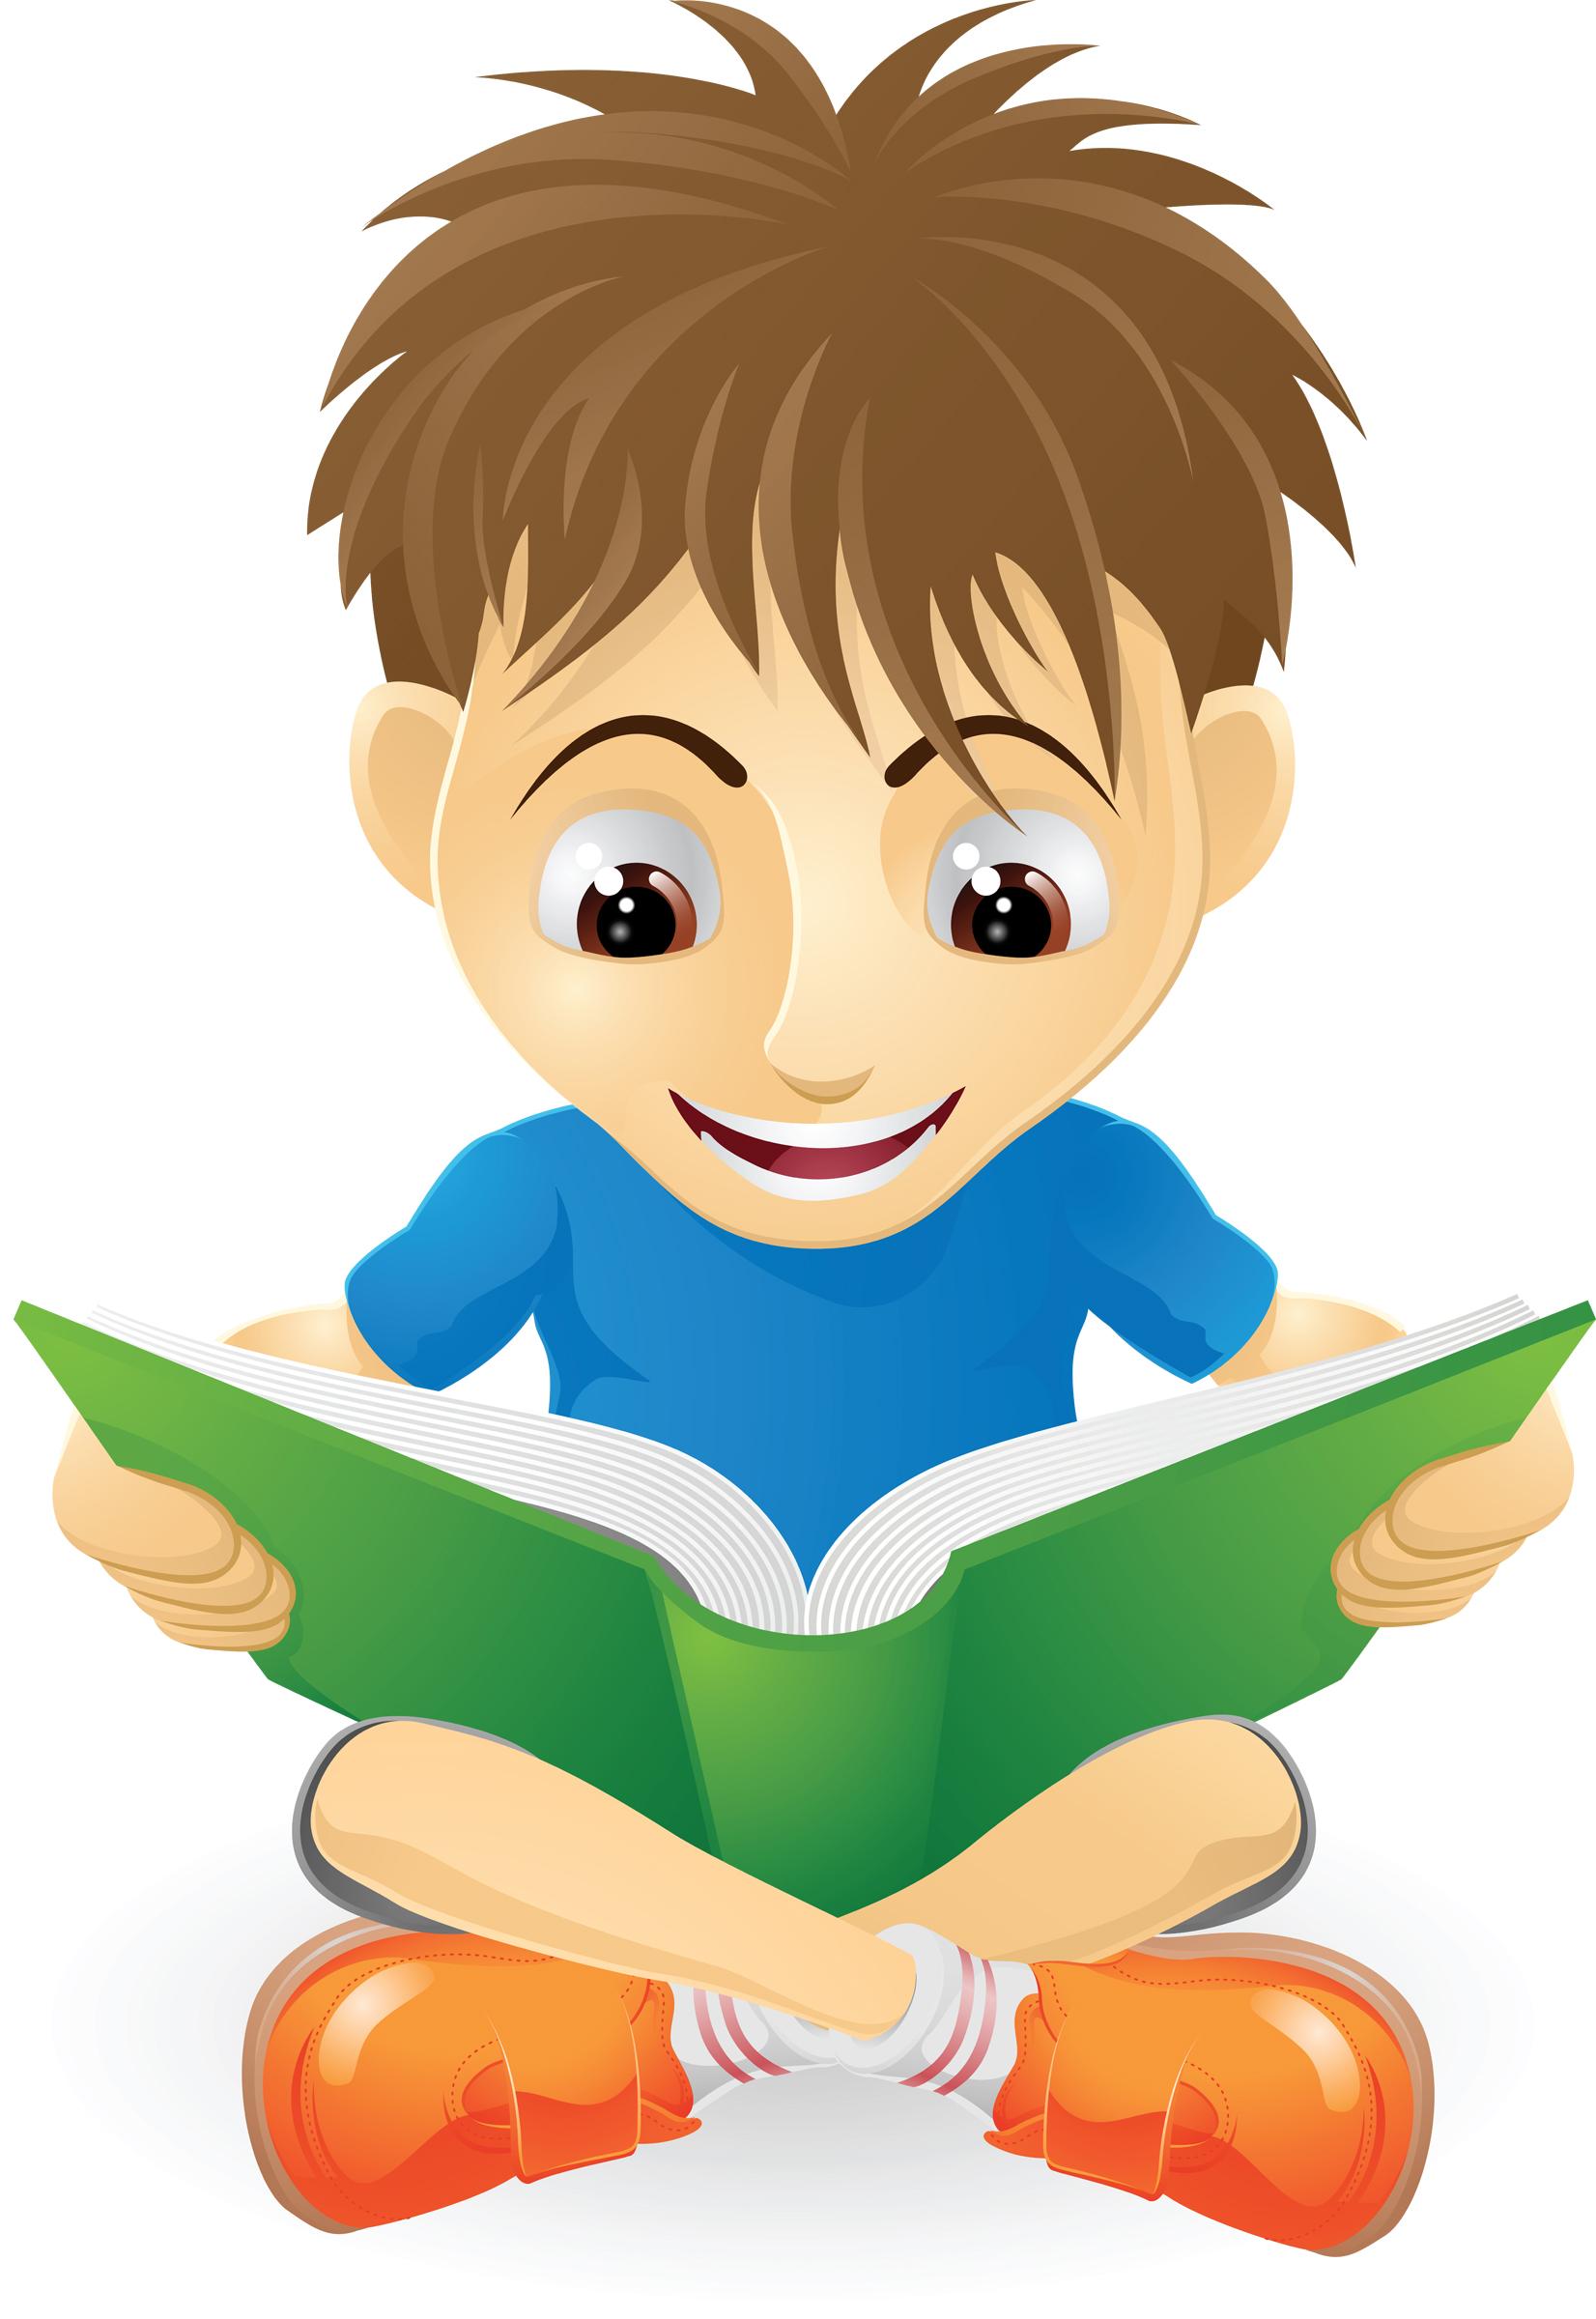 Clipart reading clip art. Child wikiclipart